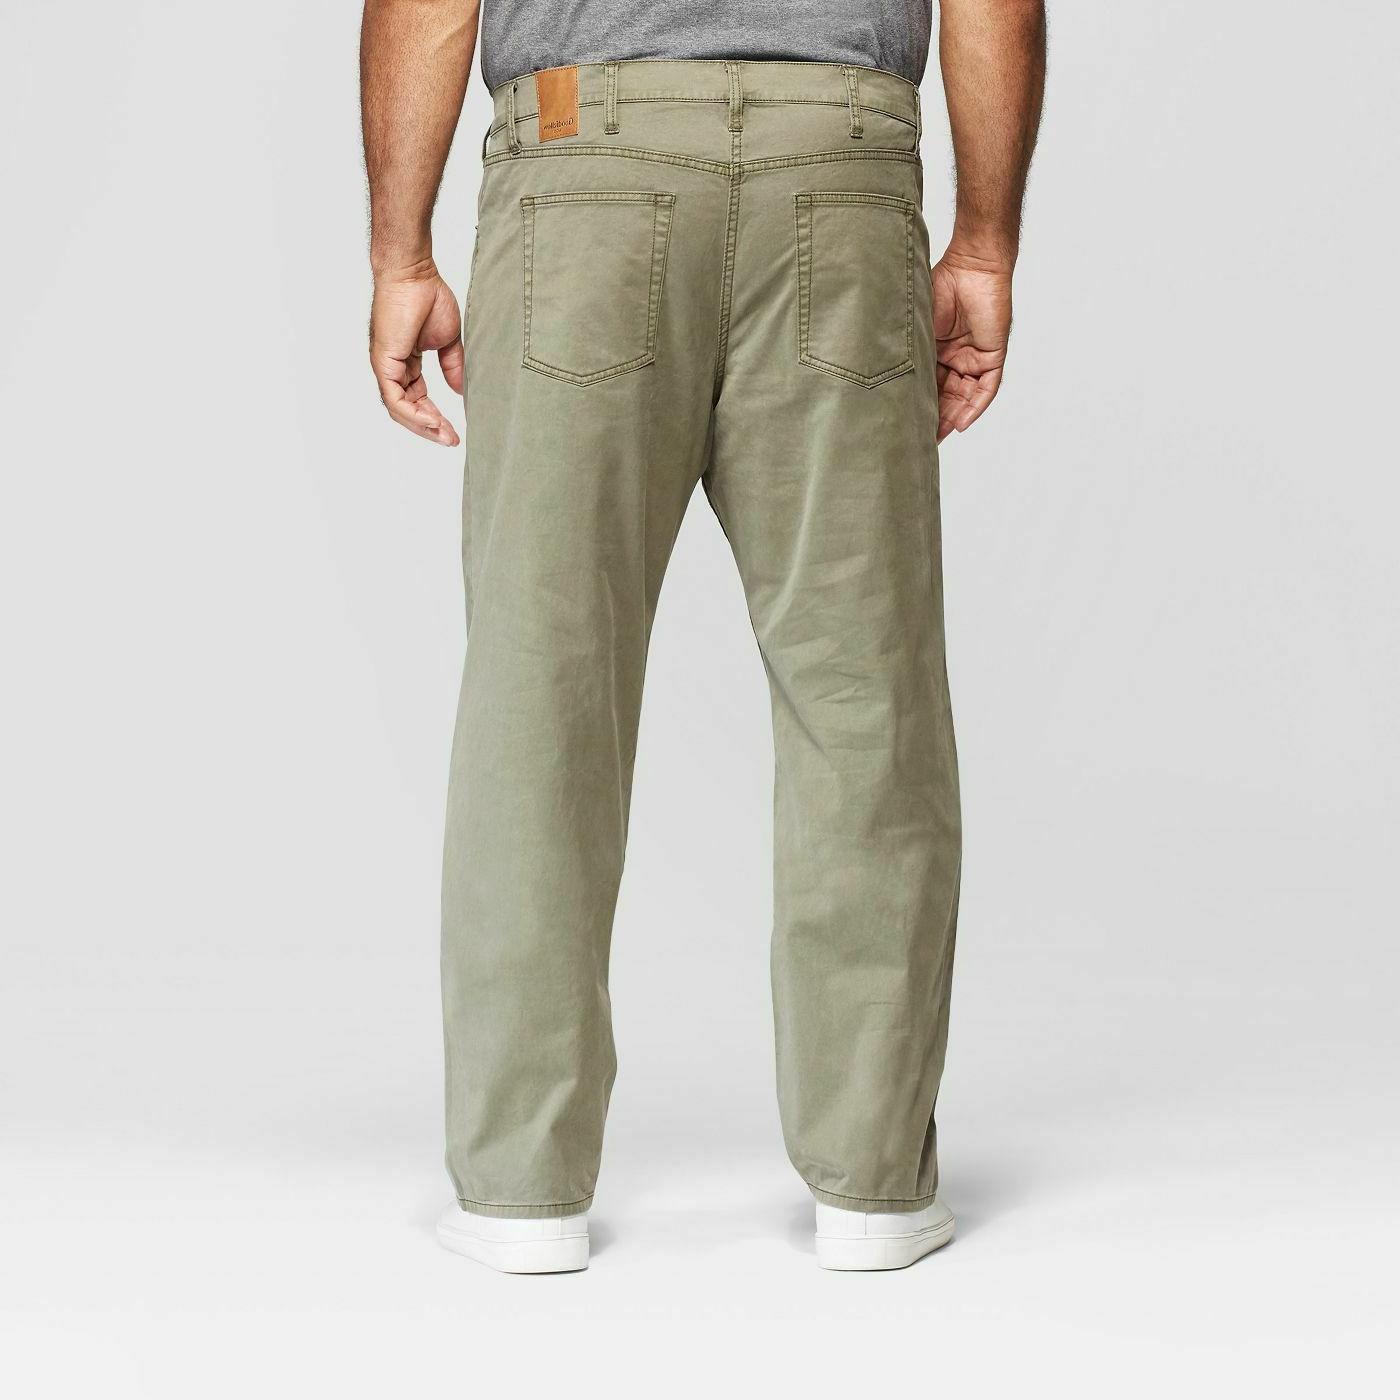 Men's Slim Pants Goodfellow & Co